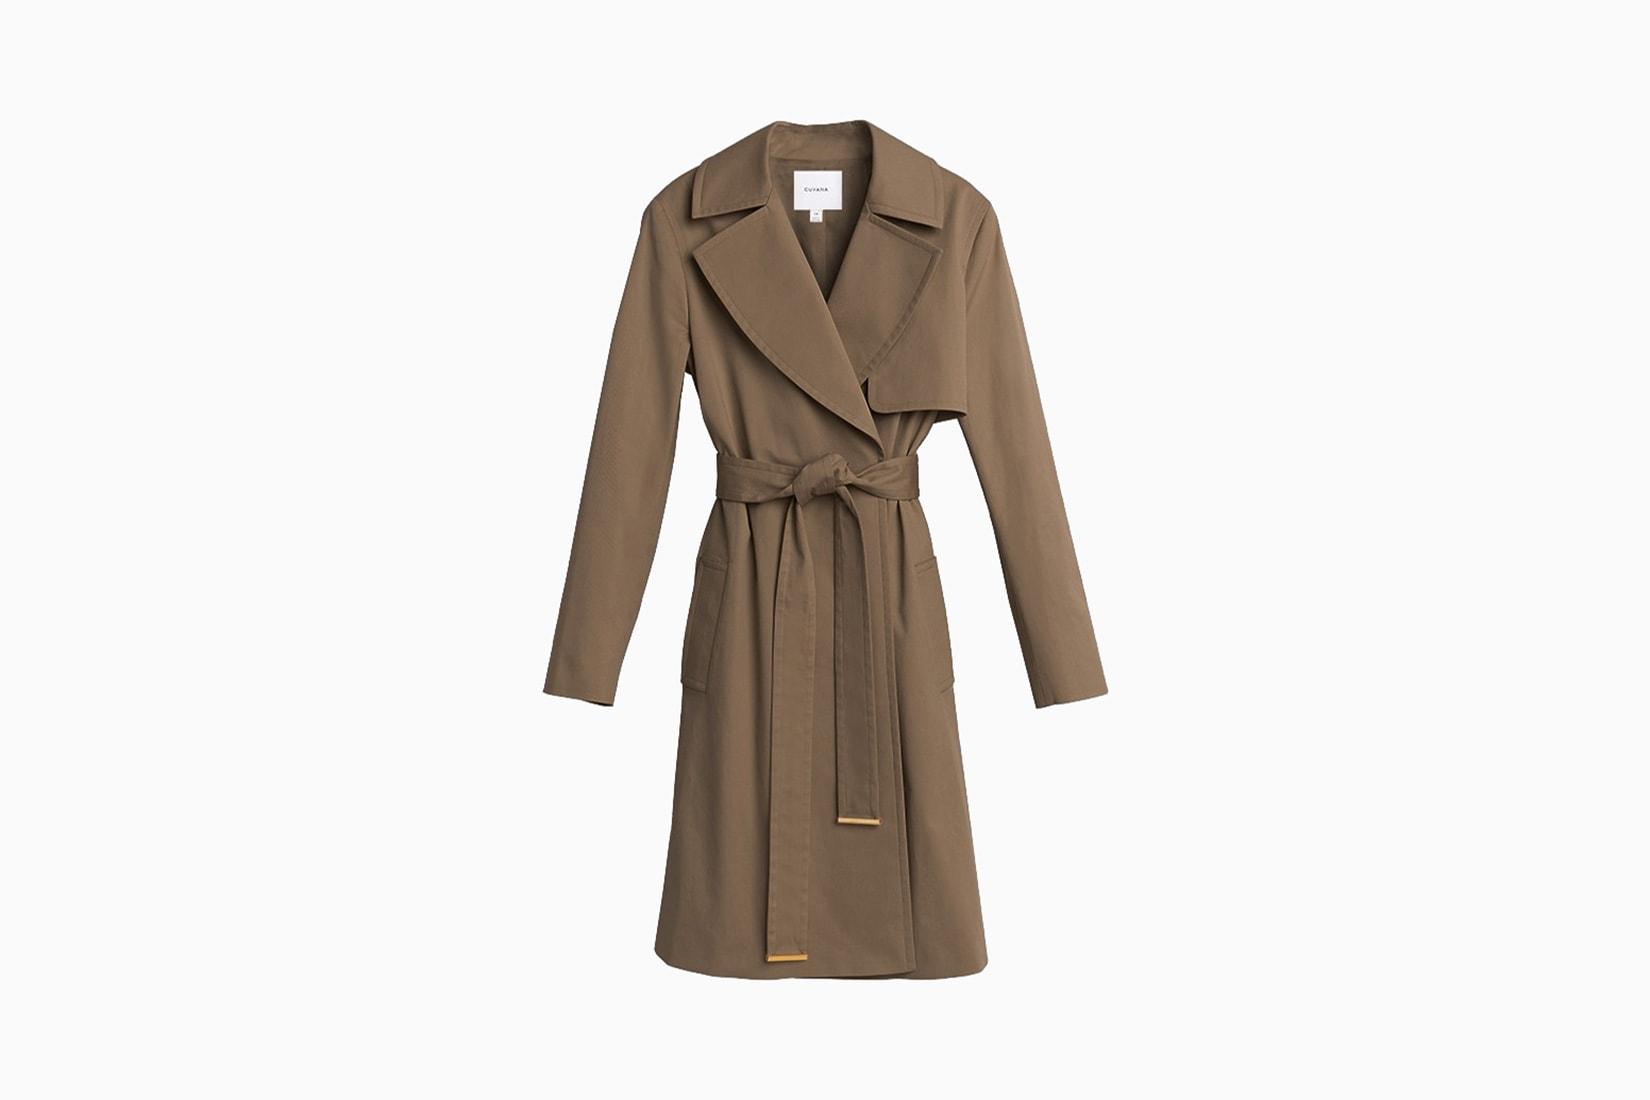 best winter coats women cuyana classic trench review - Luxe Digital